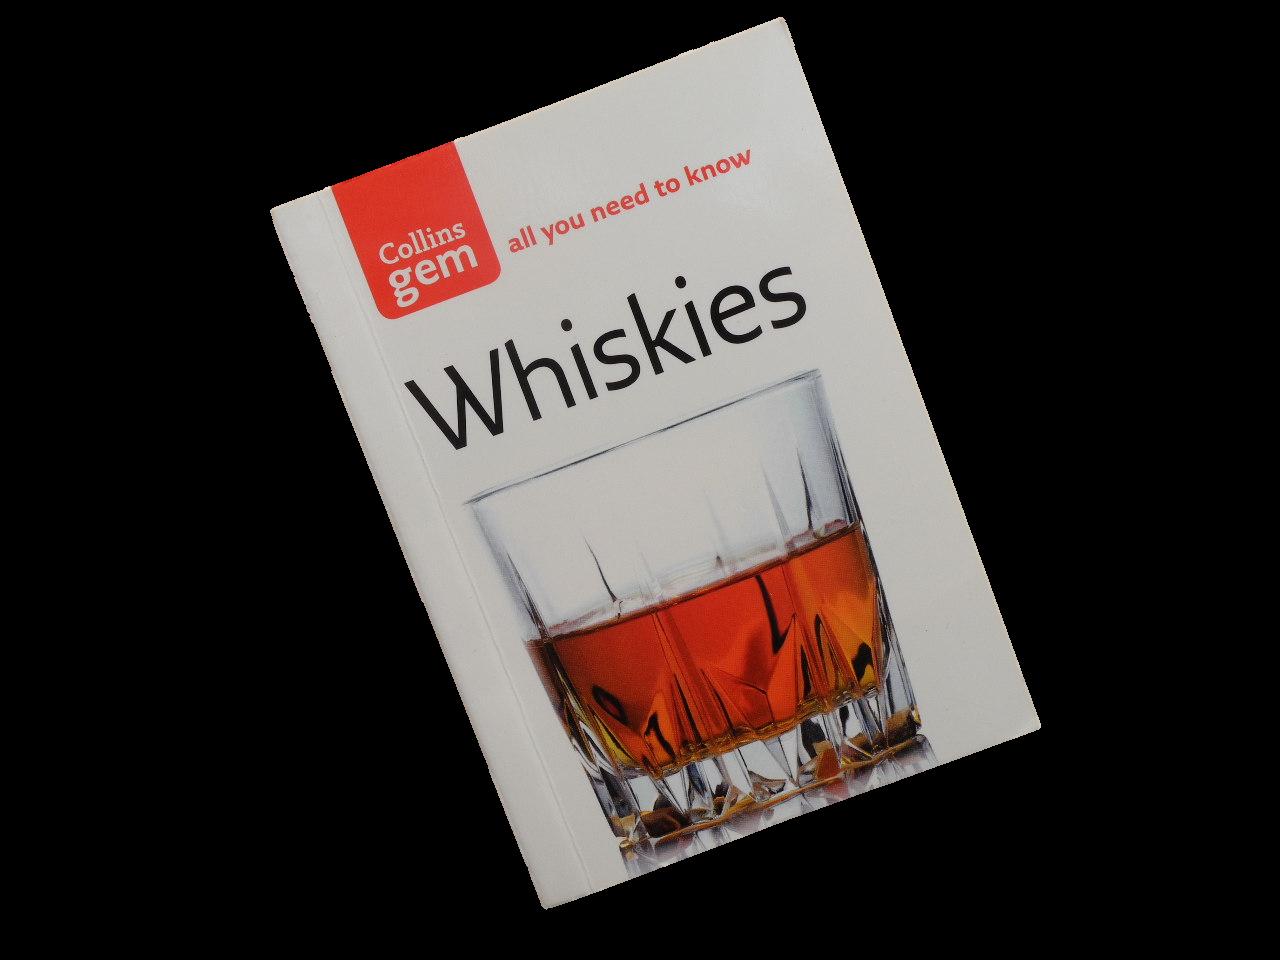 scottish pocket book scotch whisky